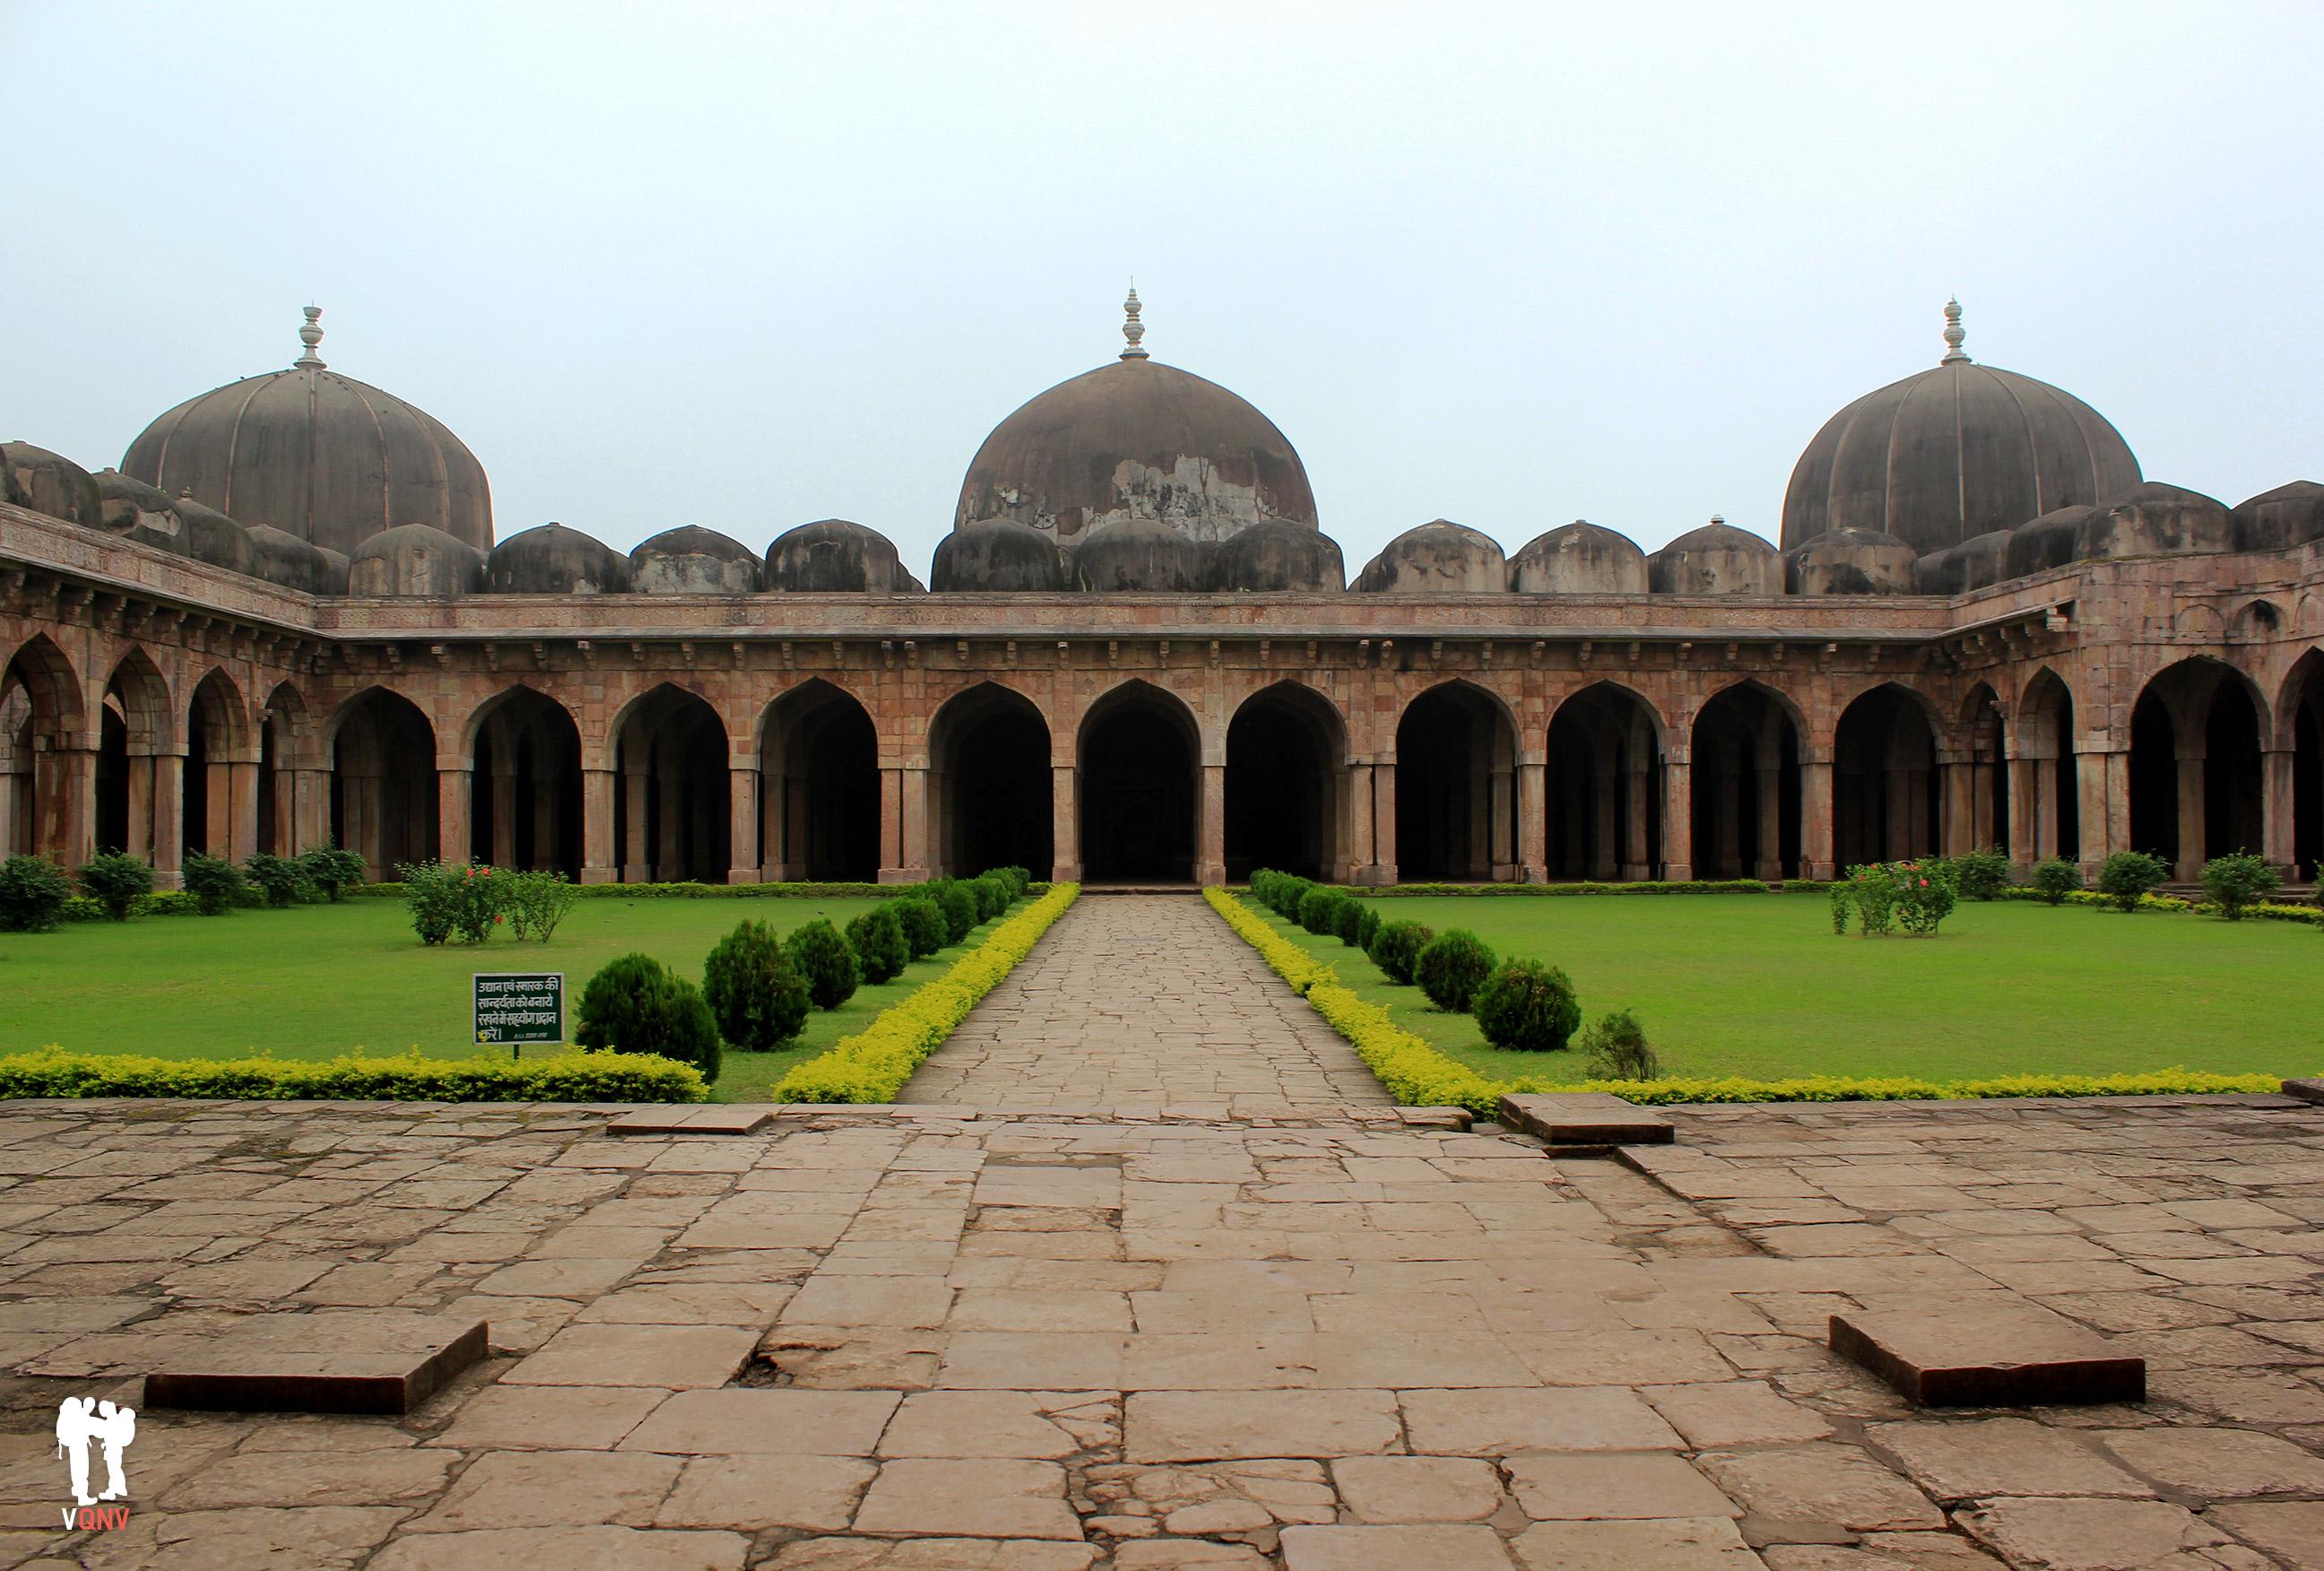 Mezquita de Jama Masjid